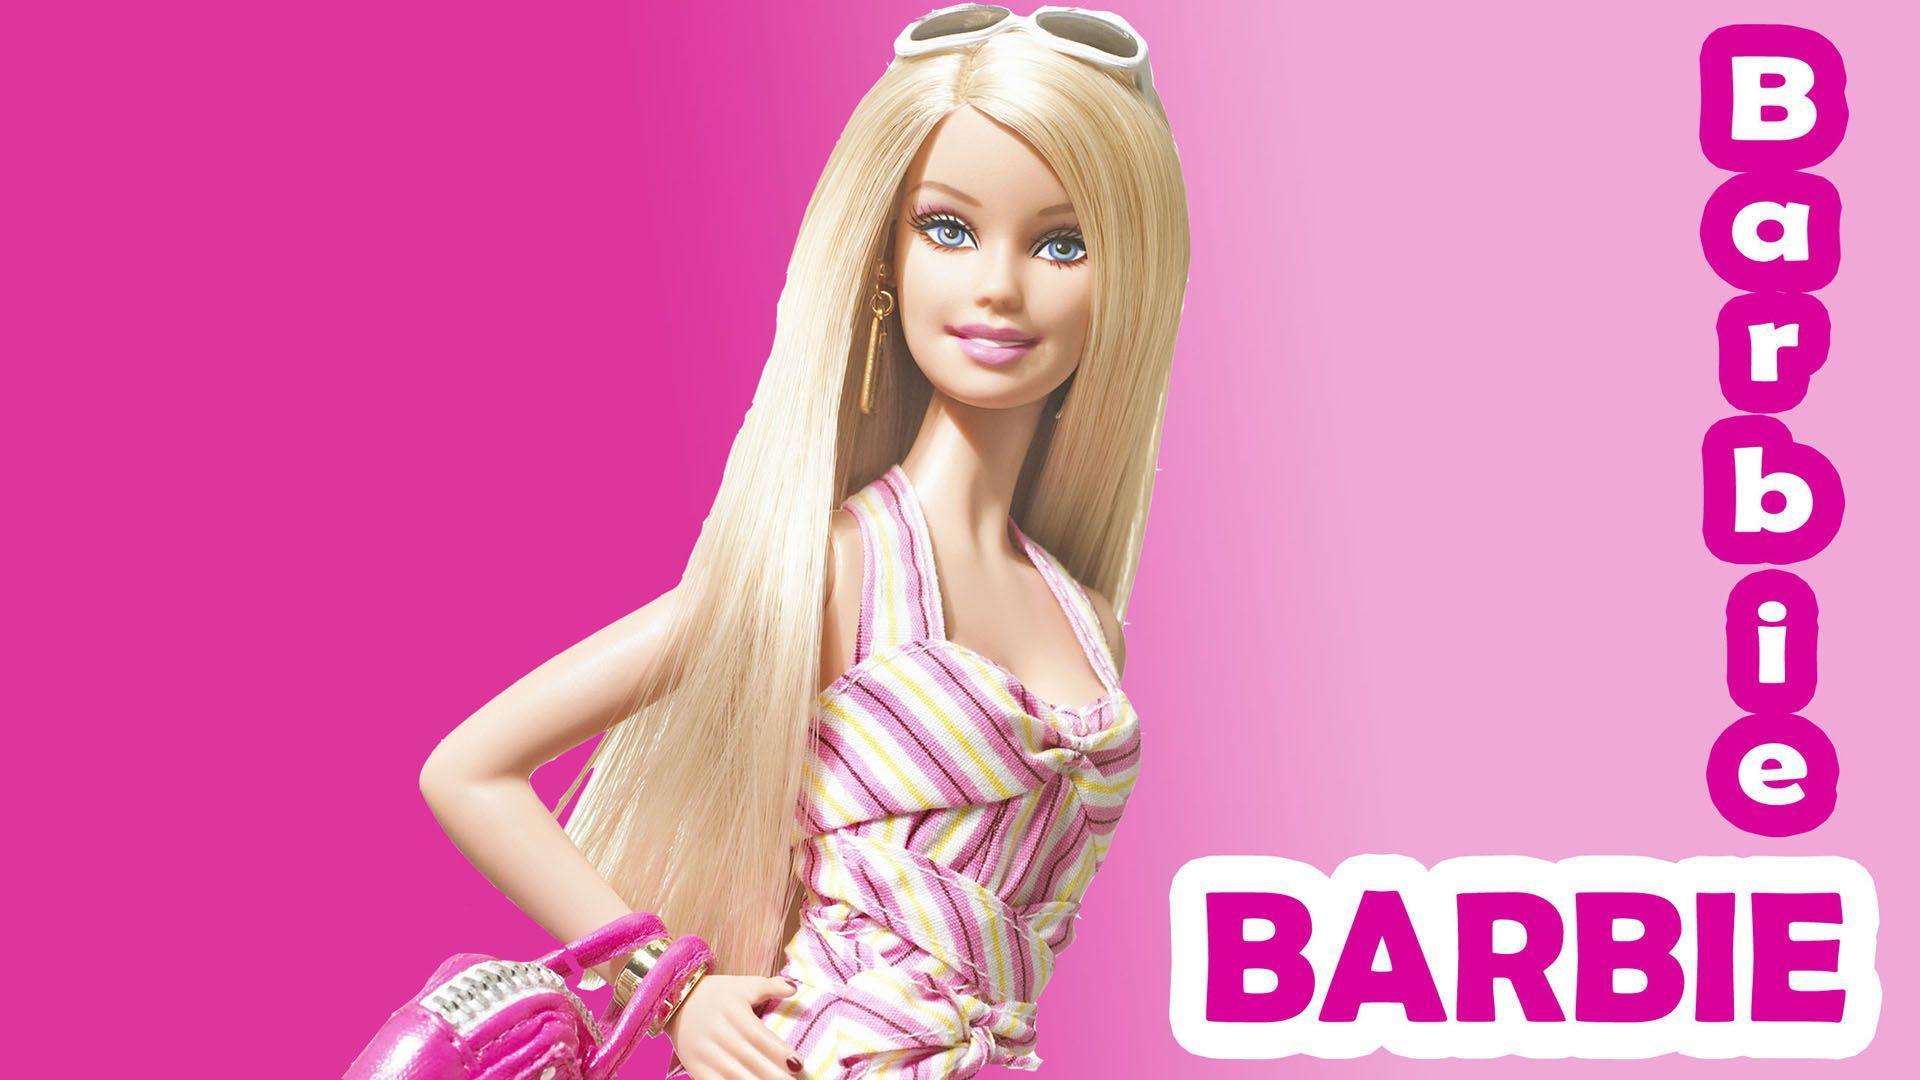 Barbie Pink Nude Photos 55